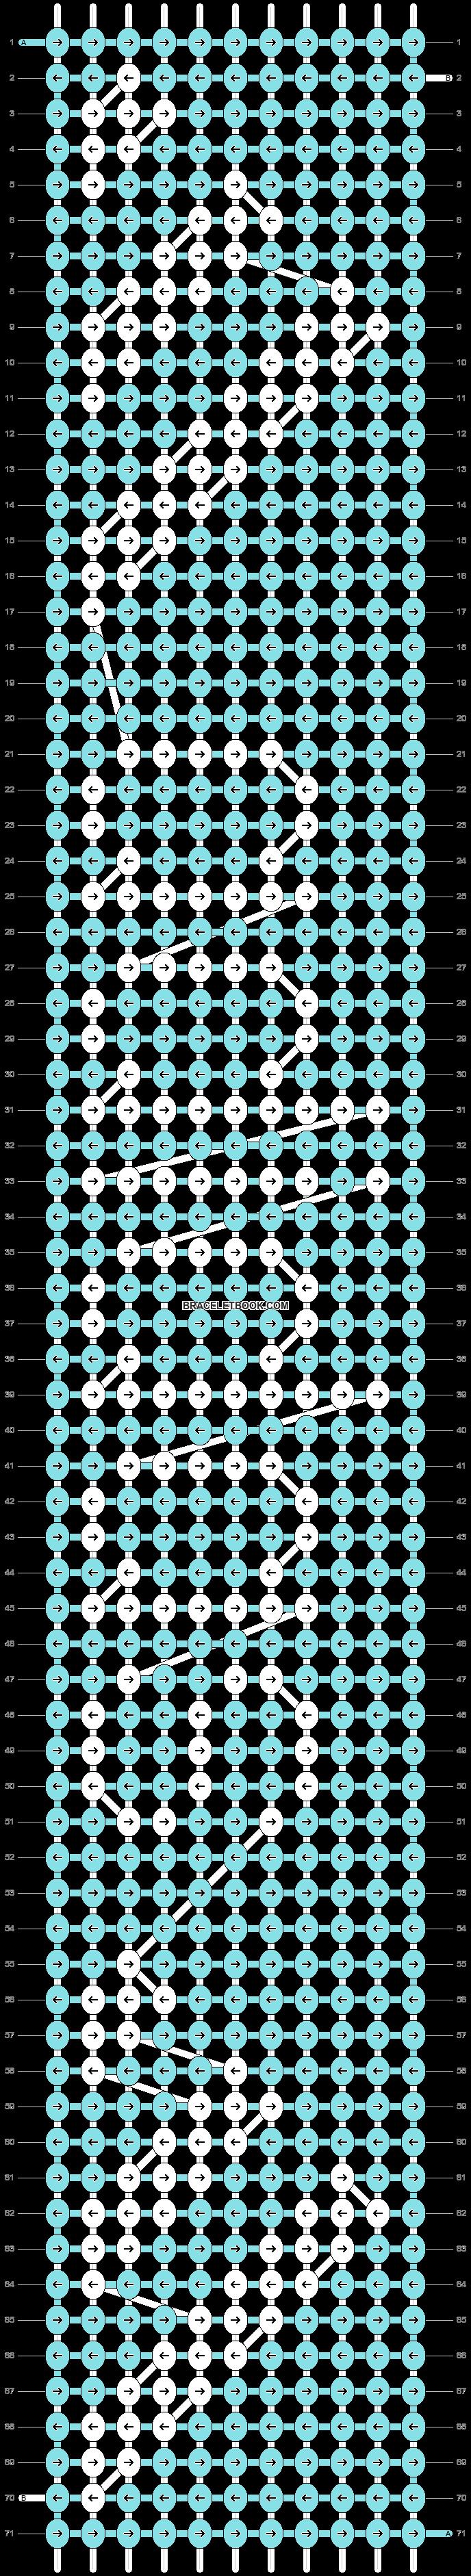 Alpha pattern #15132 pattern